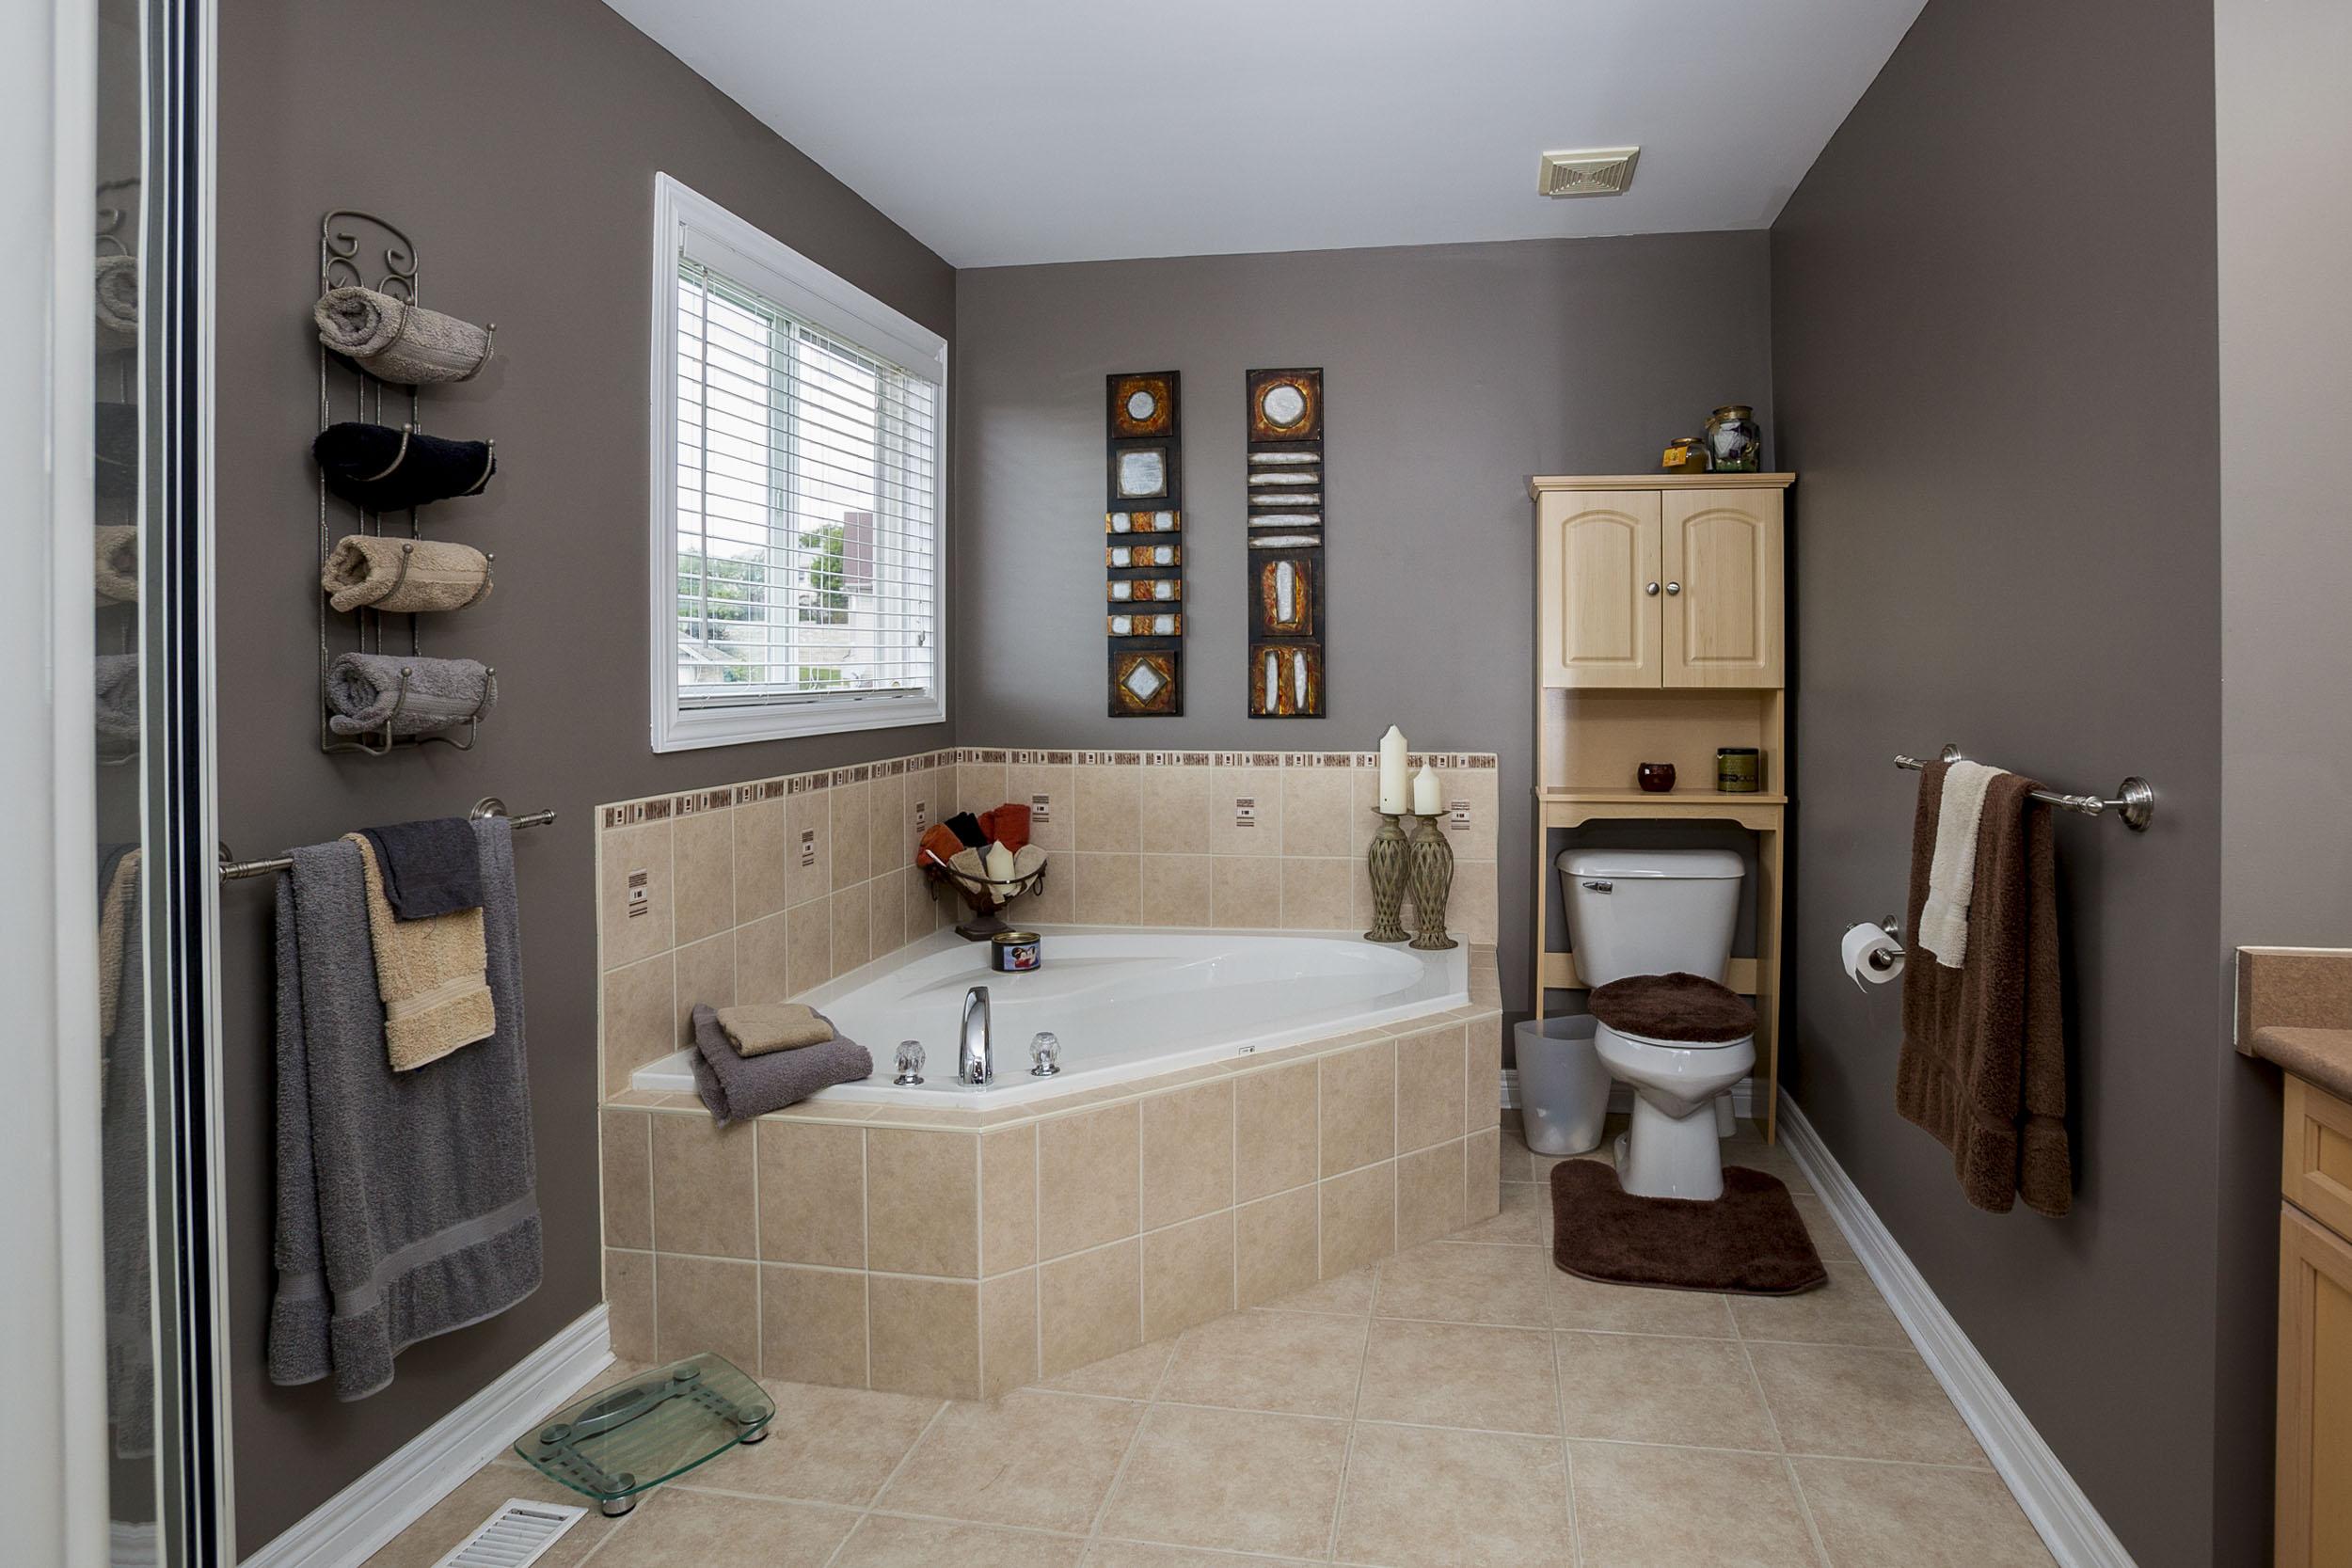 A WELL PUT TOGETHER BATHROOM